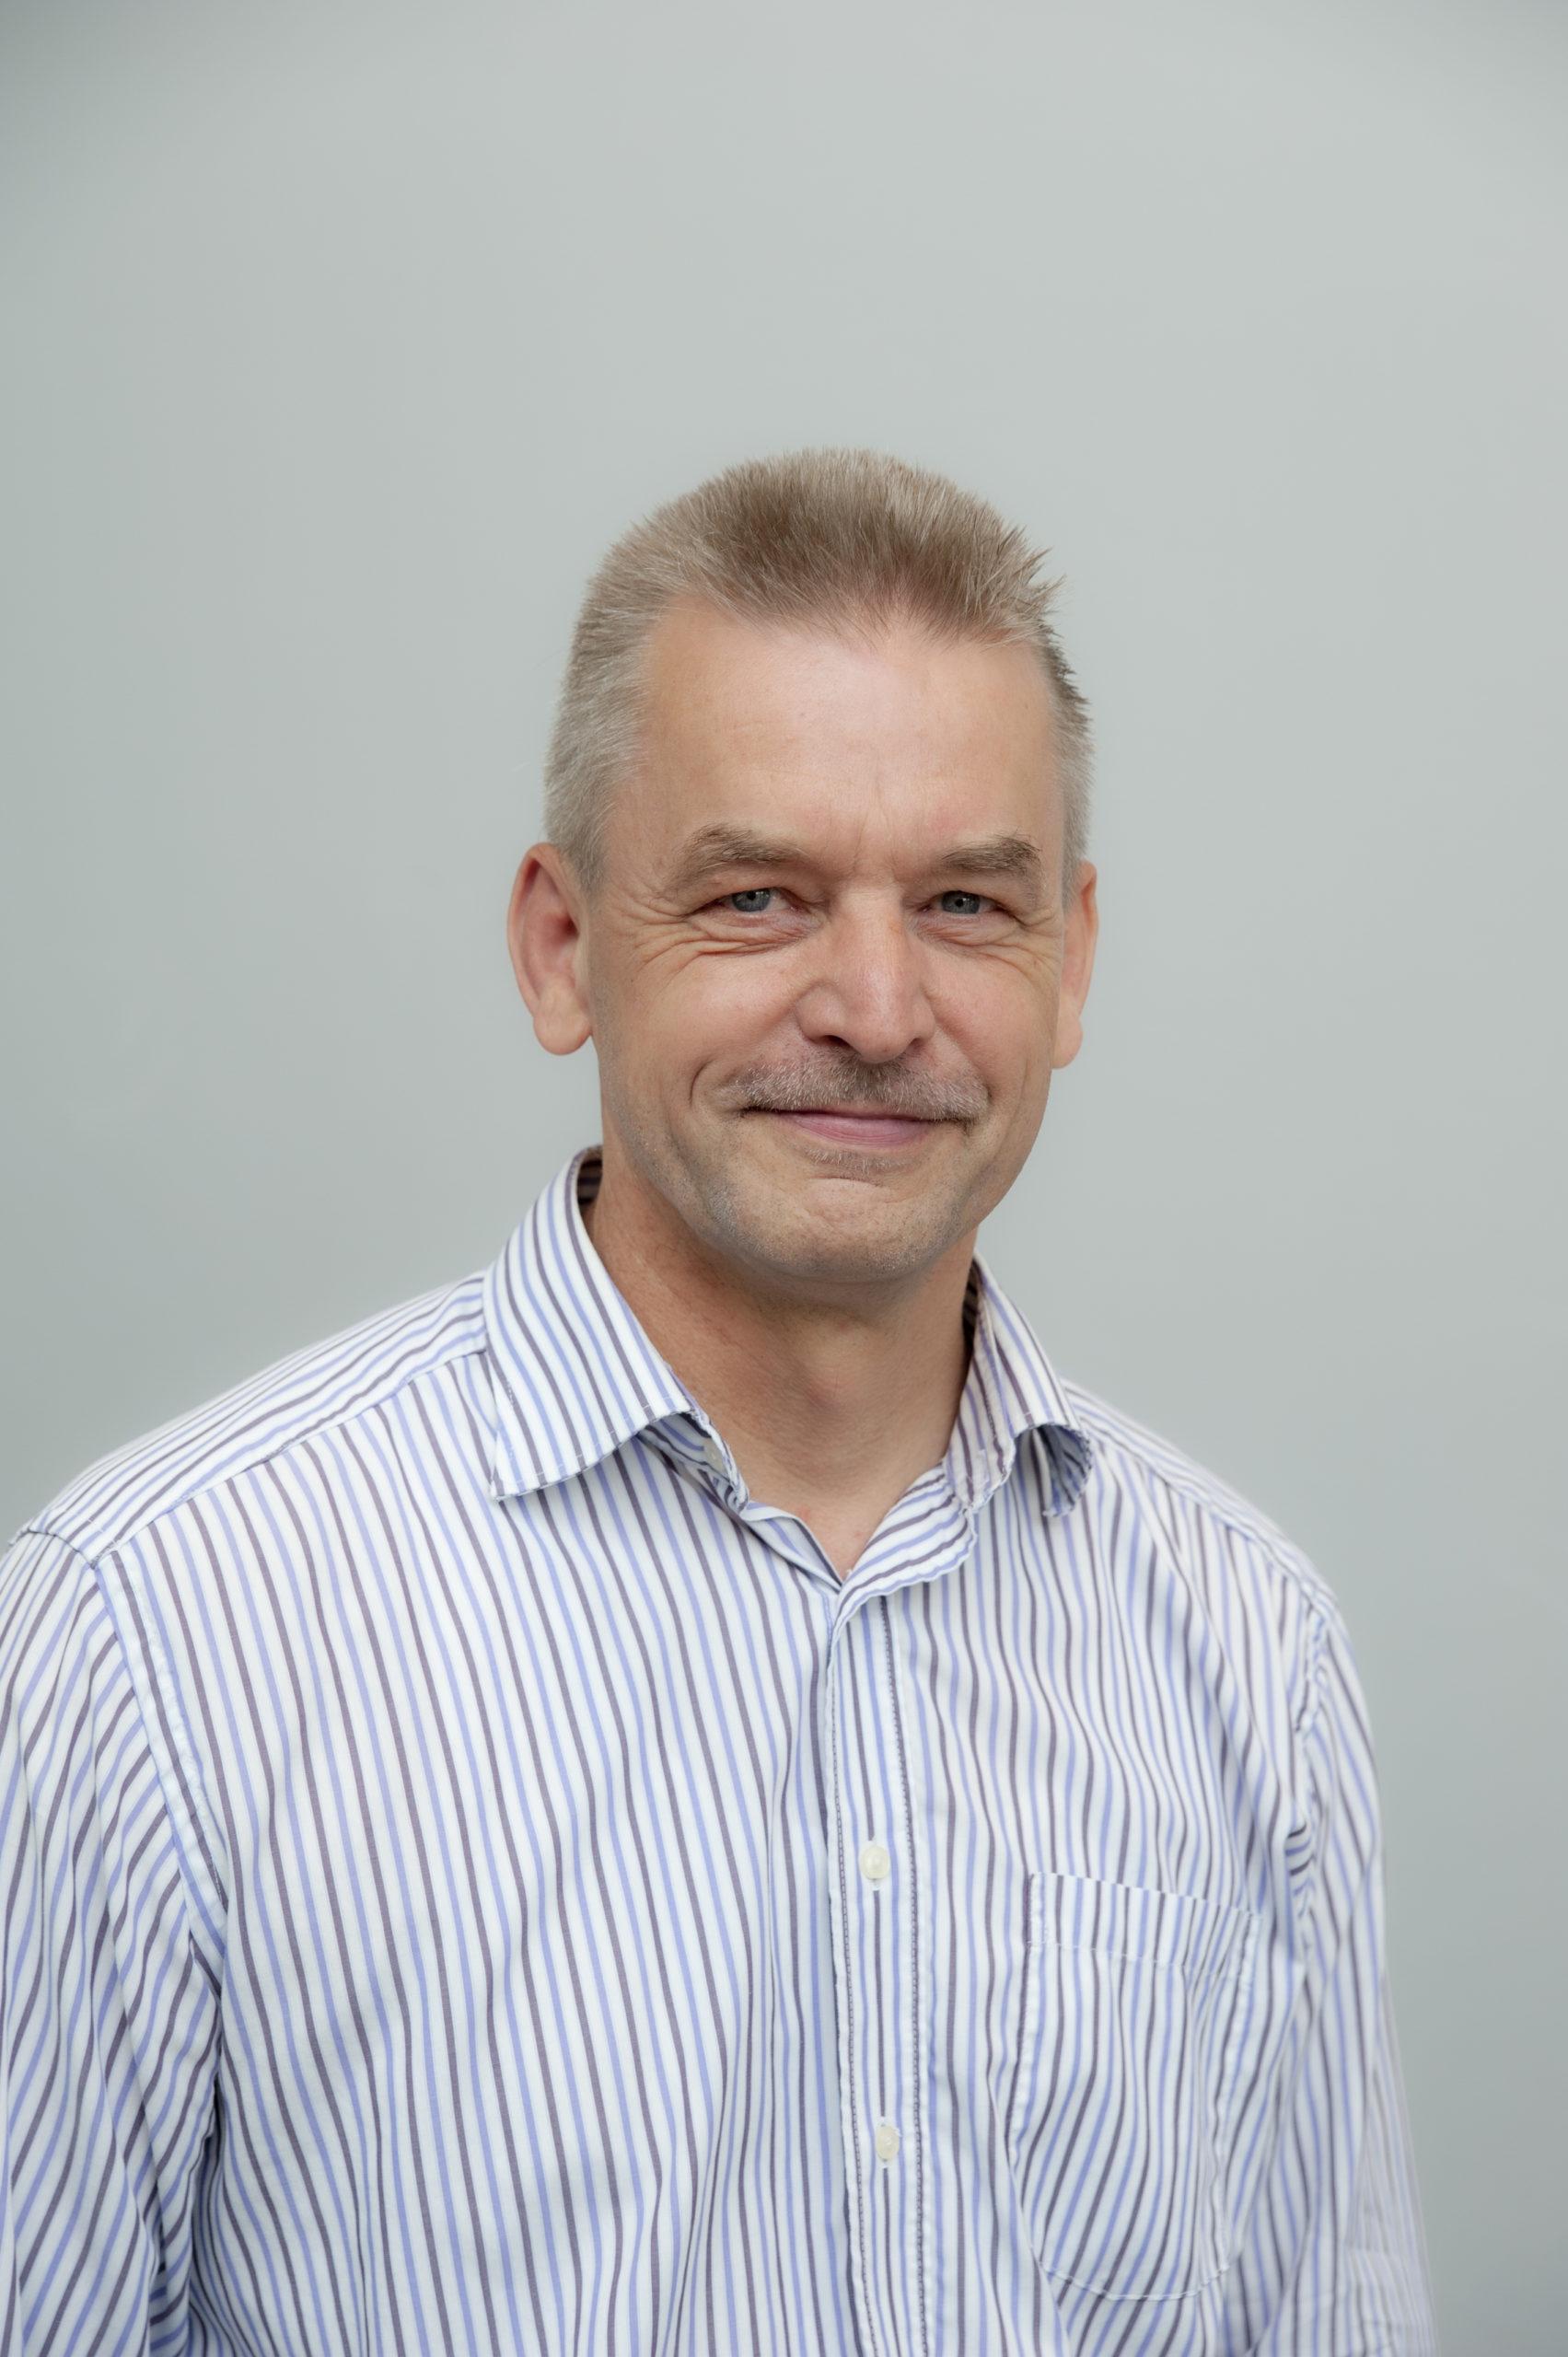 Jens Steinhoff